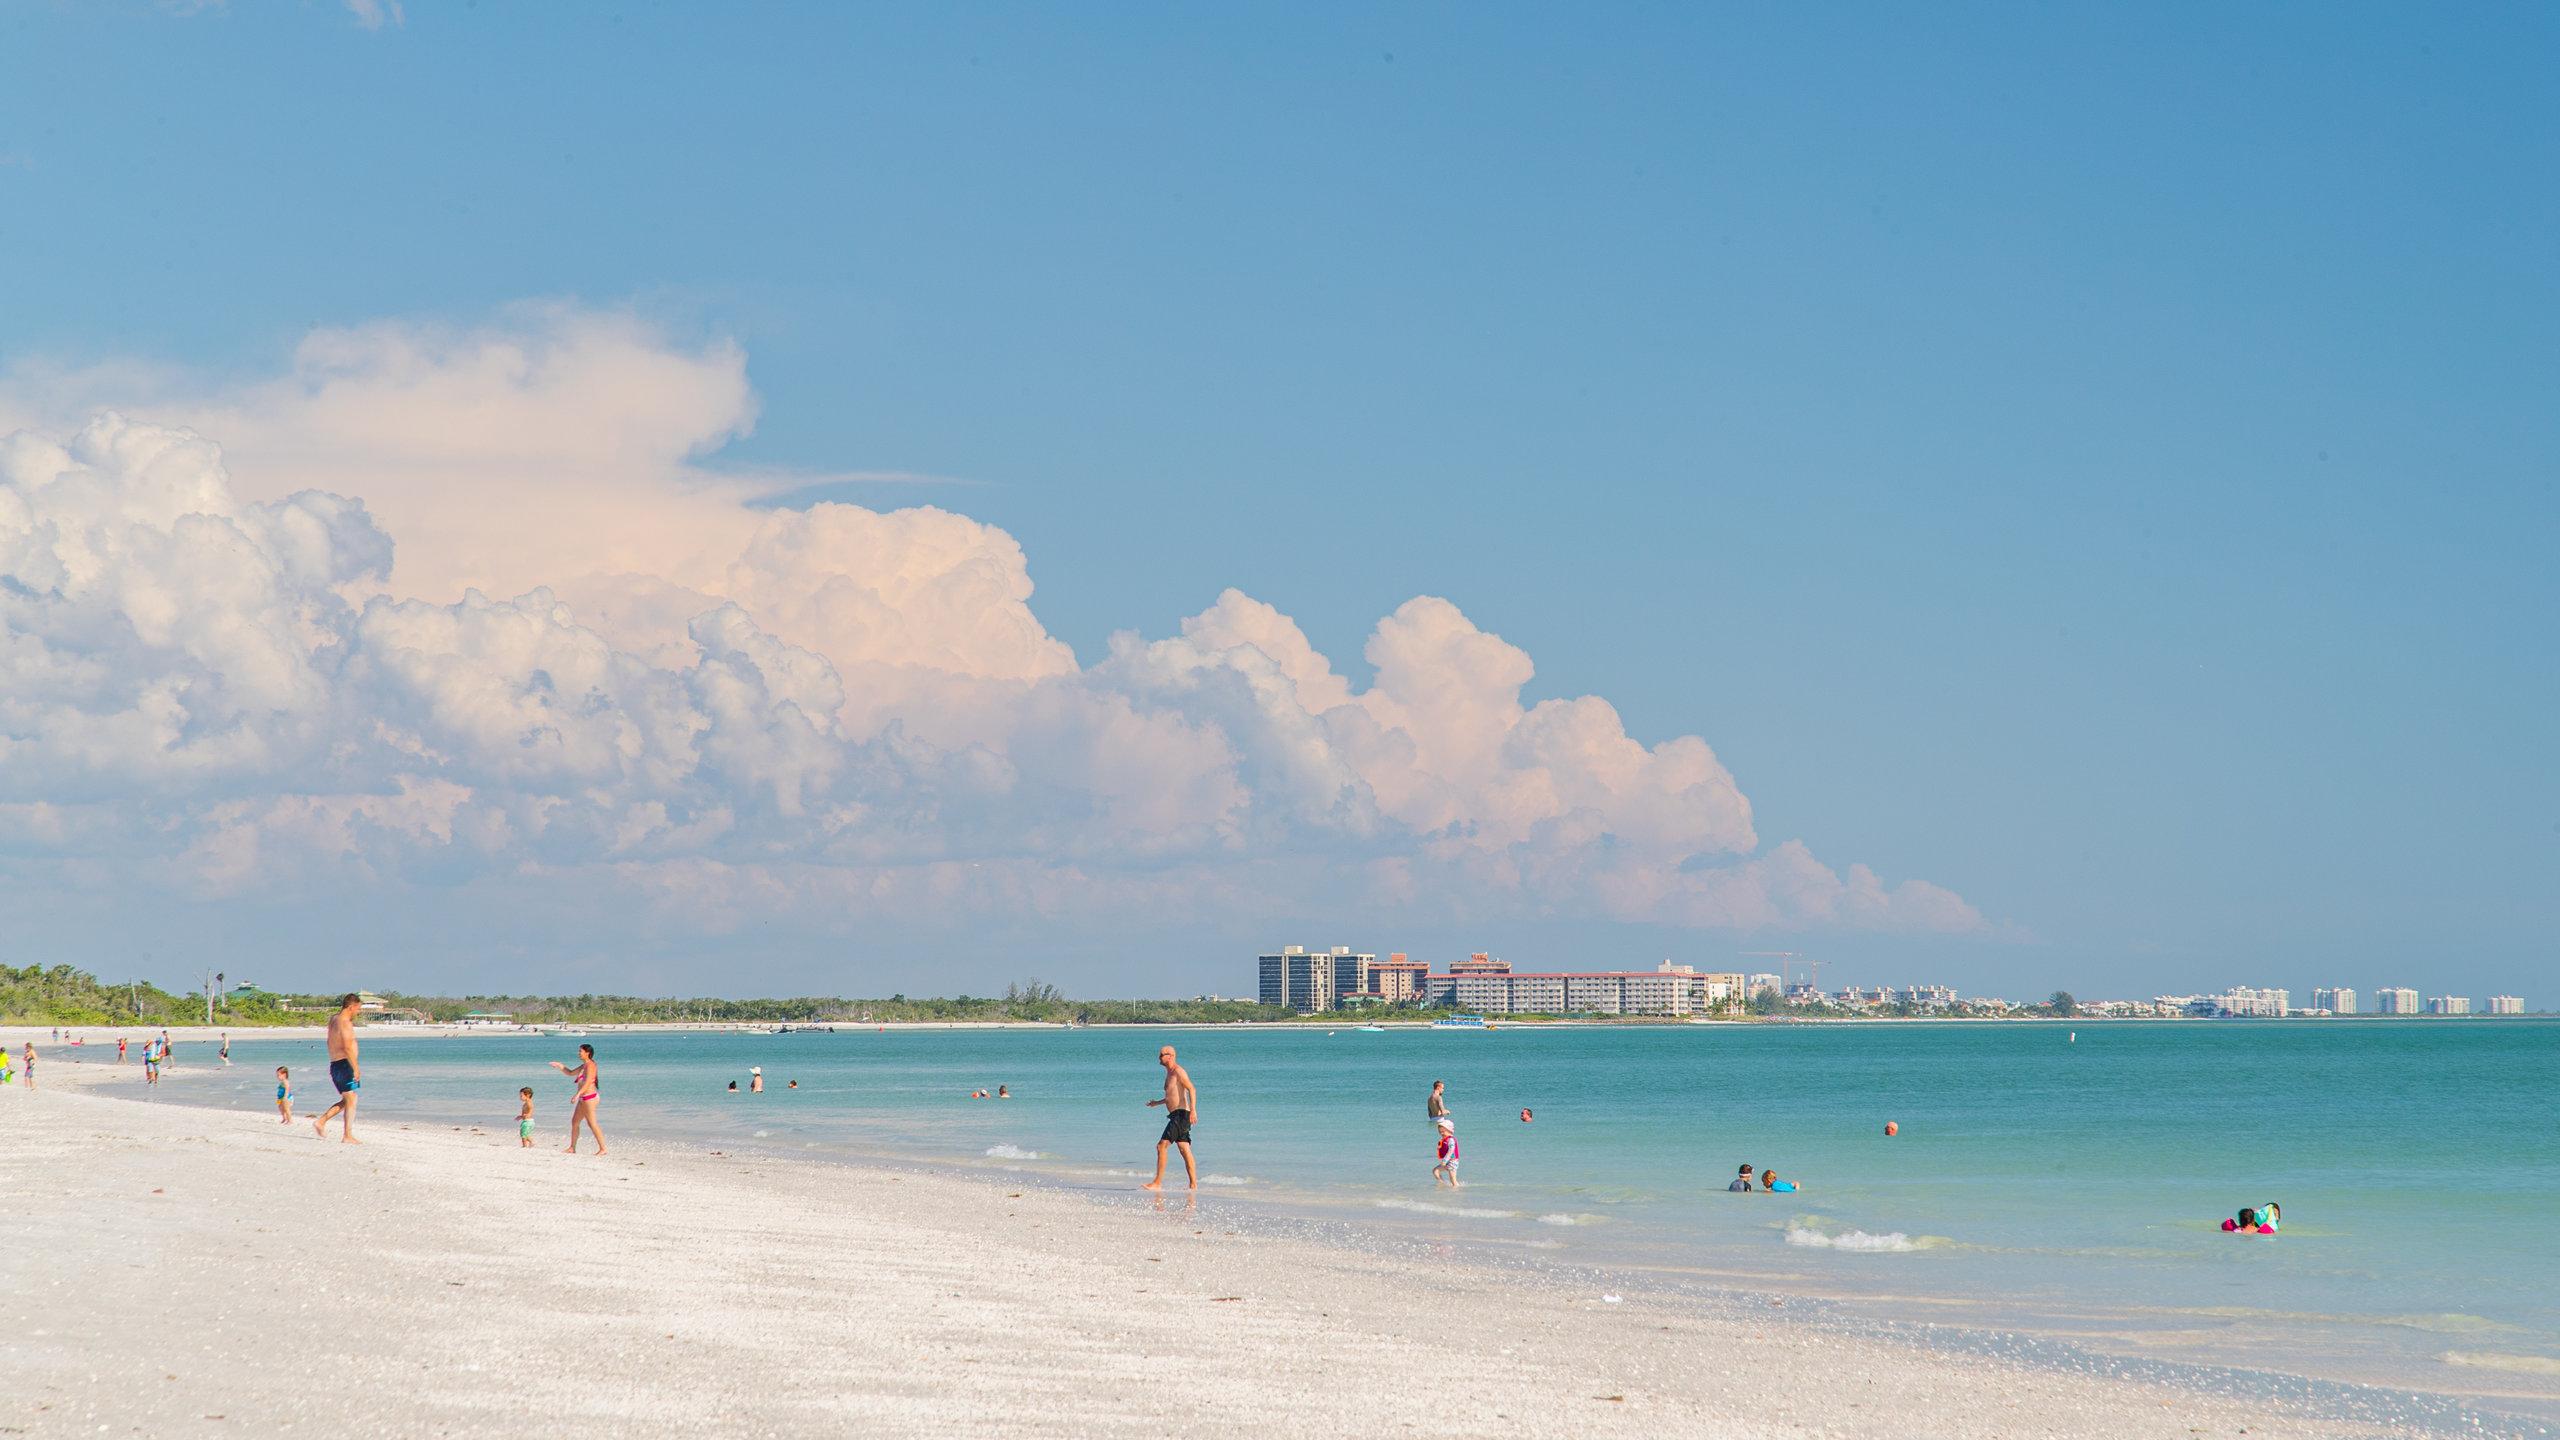 Lover's Key Beach, Florida, United States of America